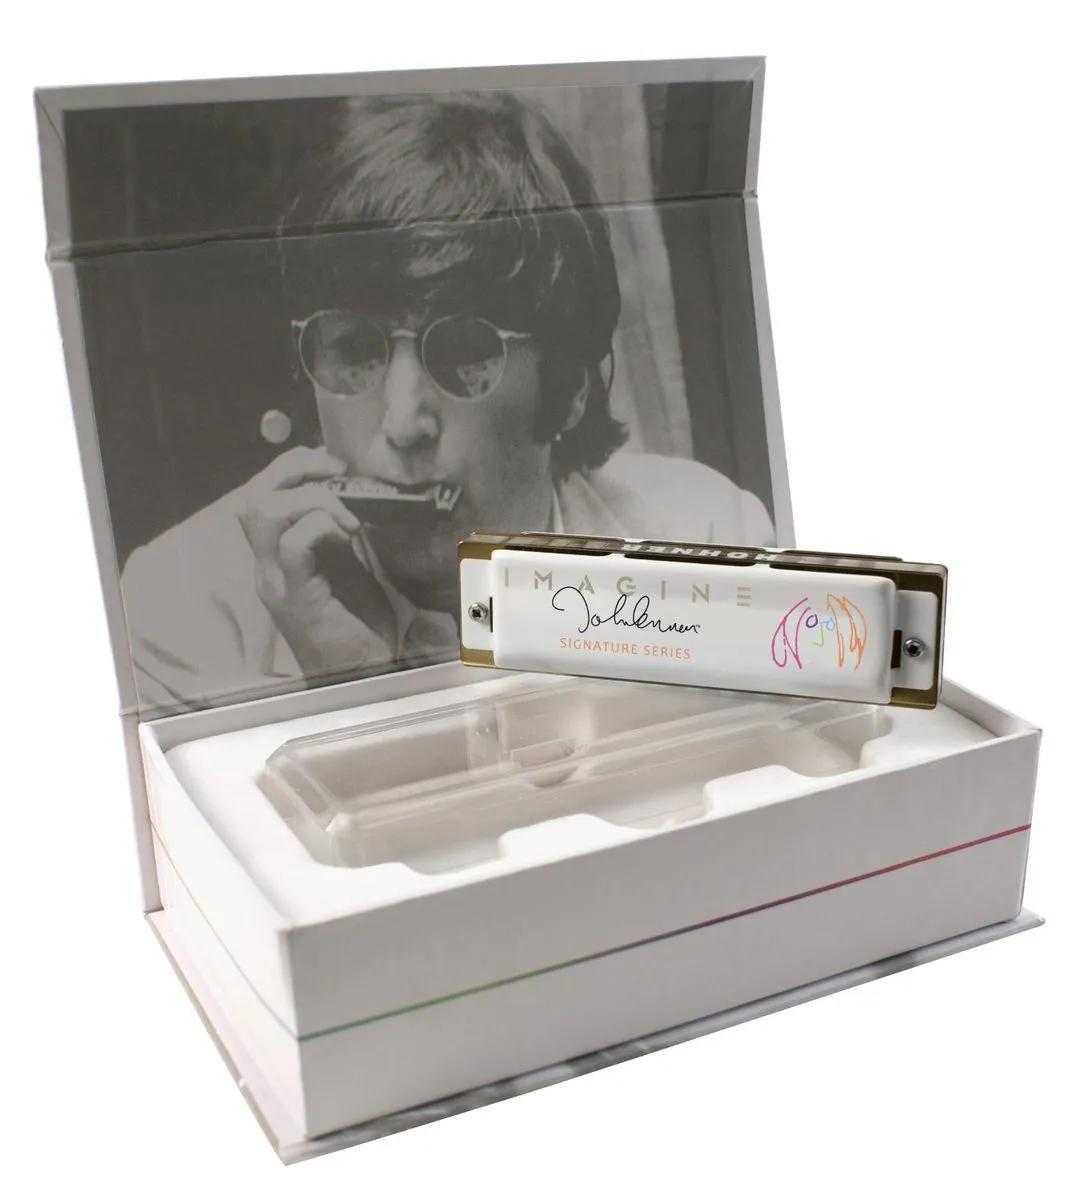 Harmonica John Lennon Signature Series C - HOHNER